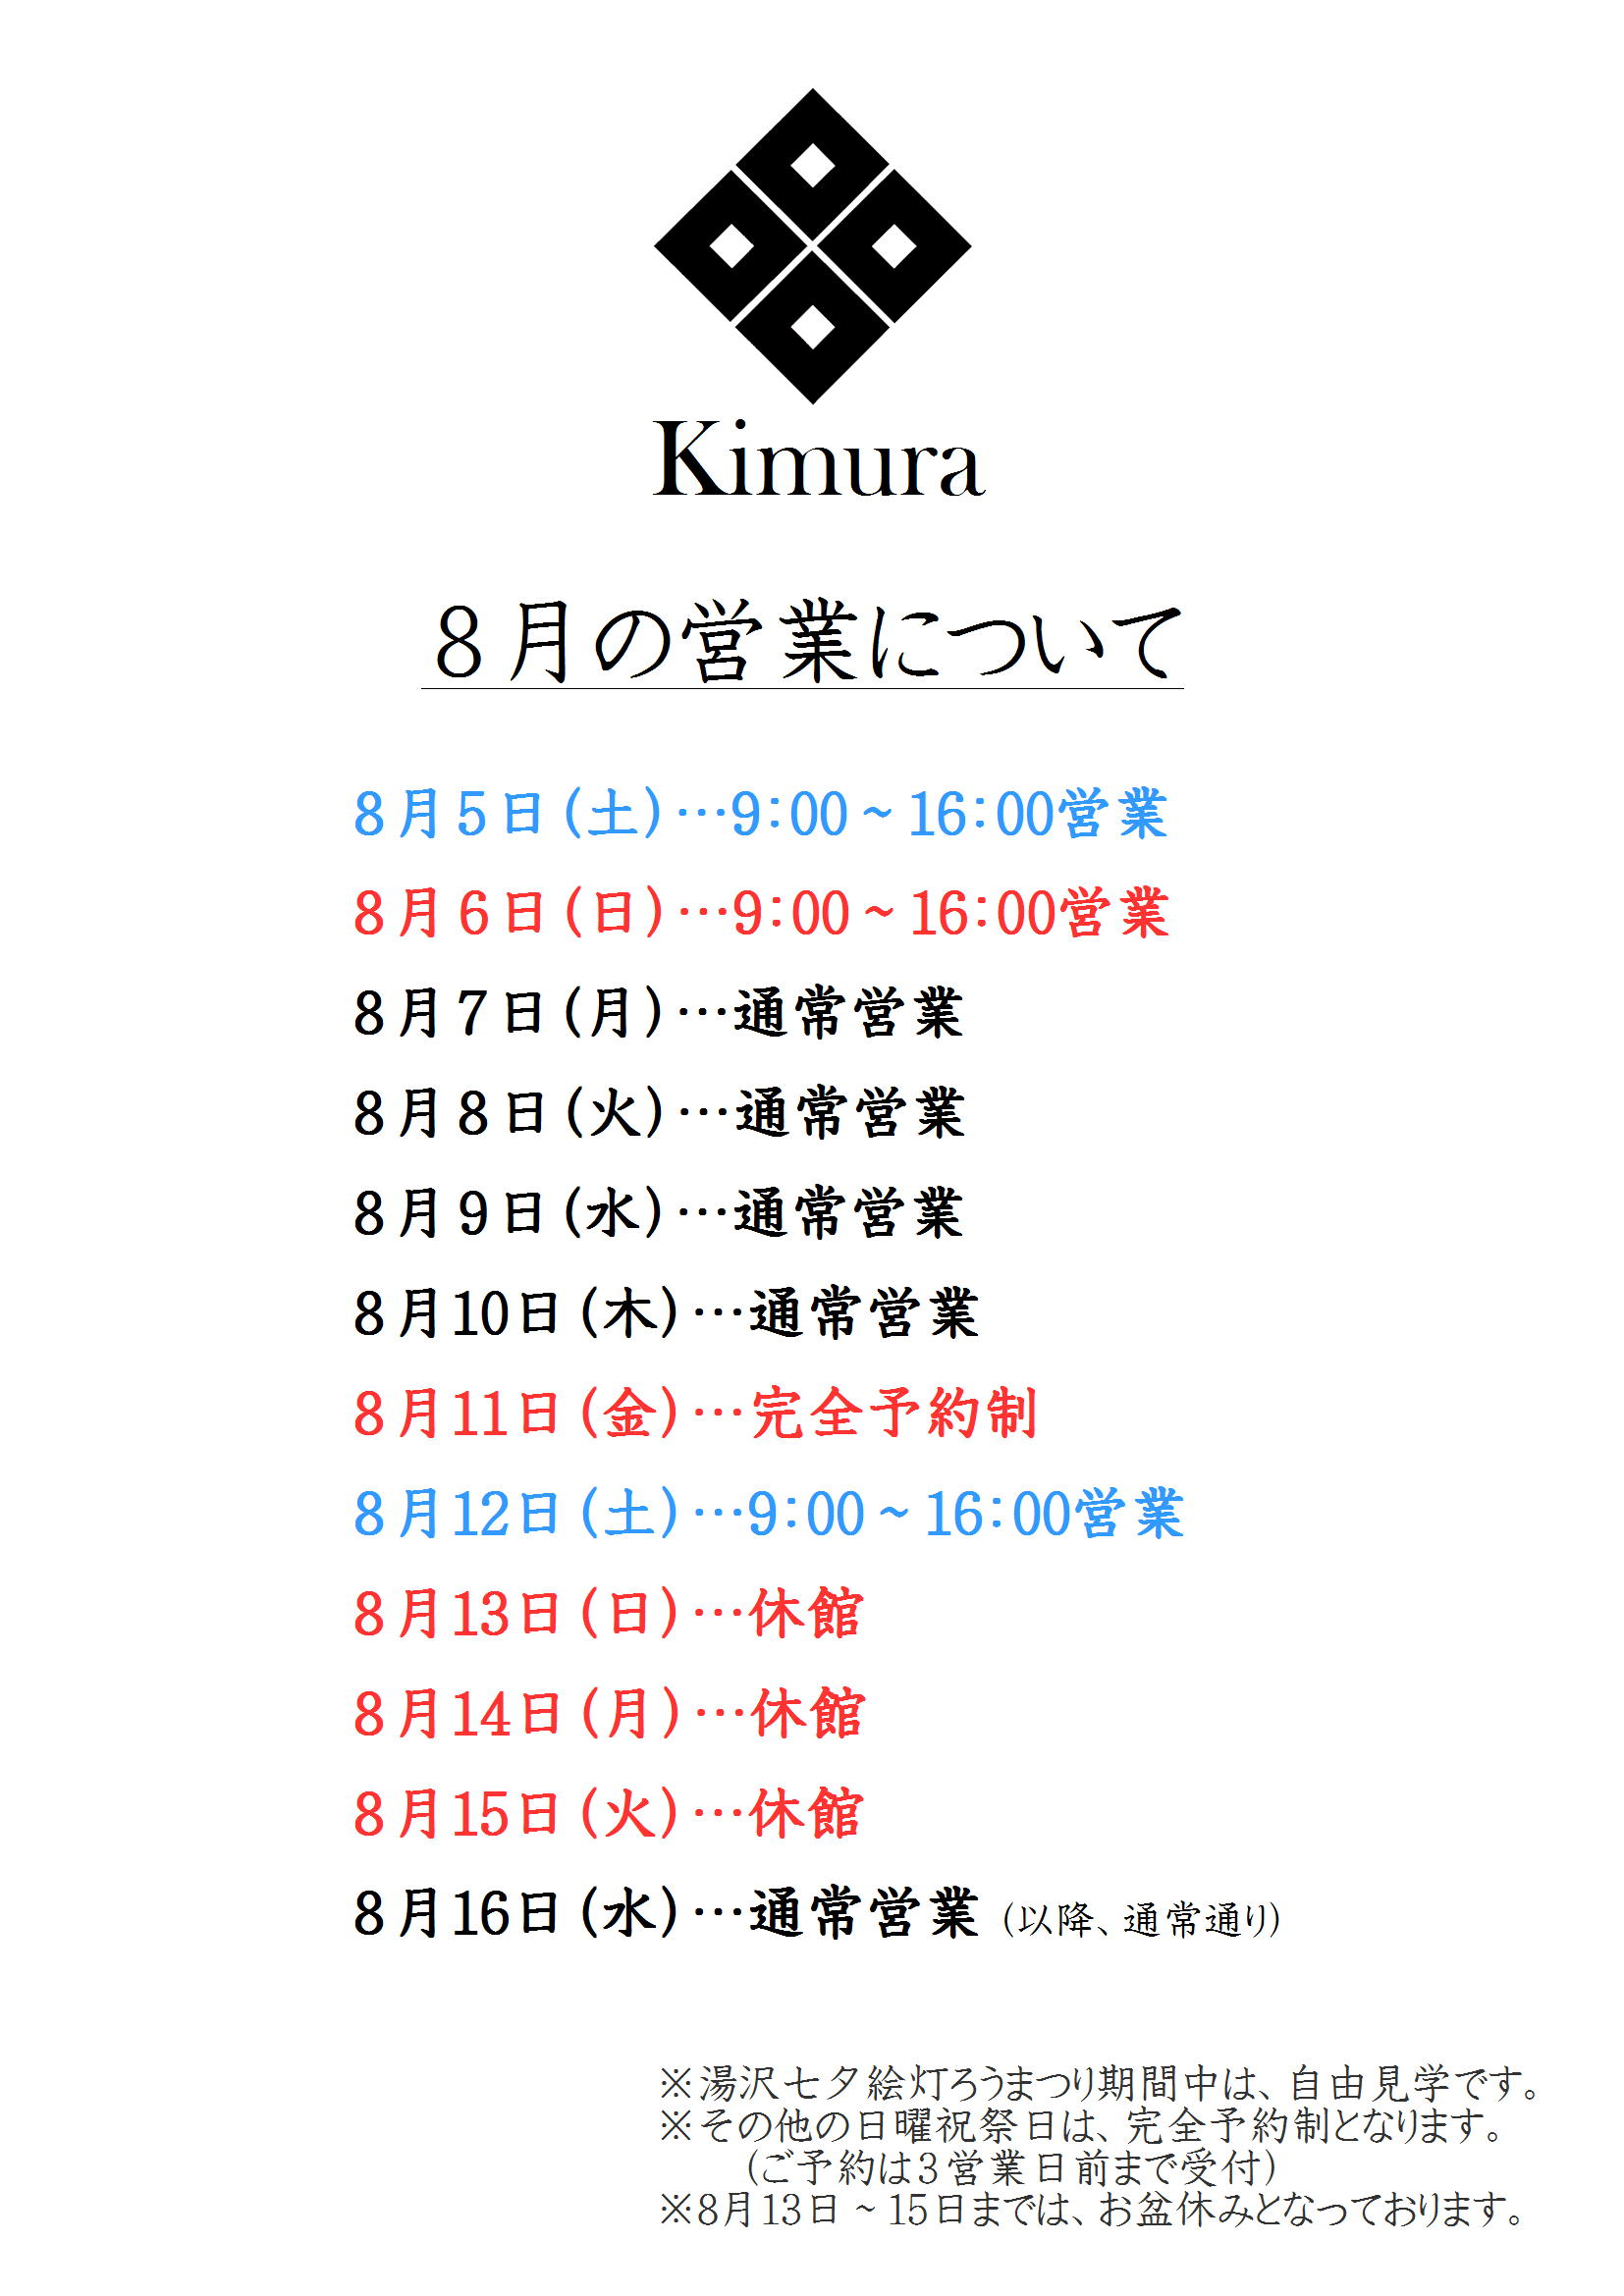 http://www.fukukomachi.com/blog/photo/20170803.JPG